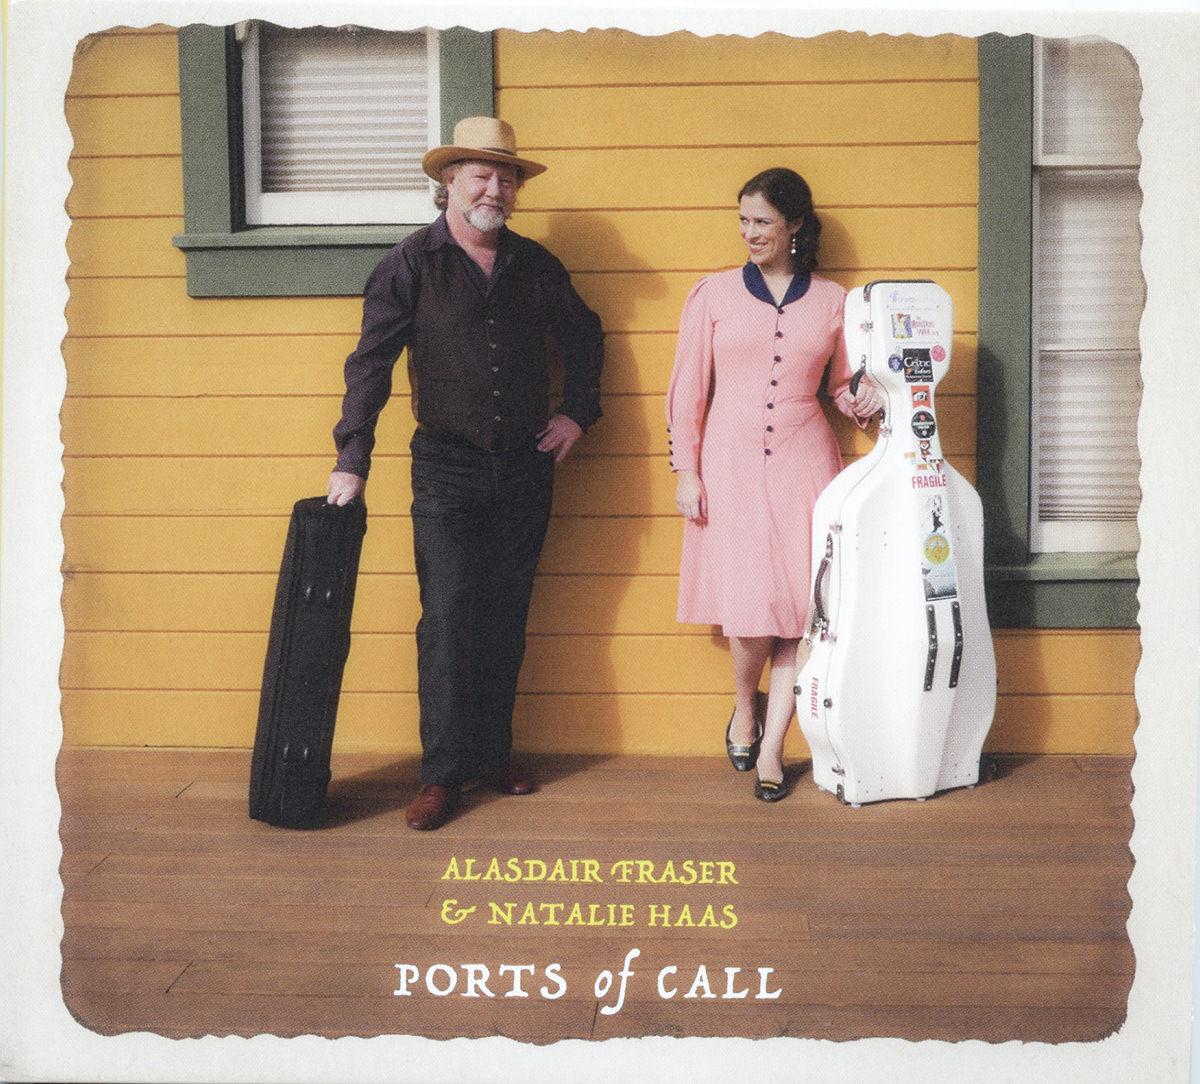 Alasdair Fraser & Natalie Haas, Ports of Call